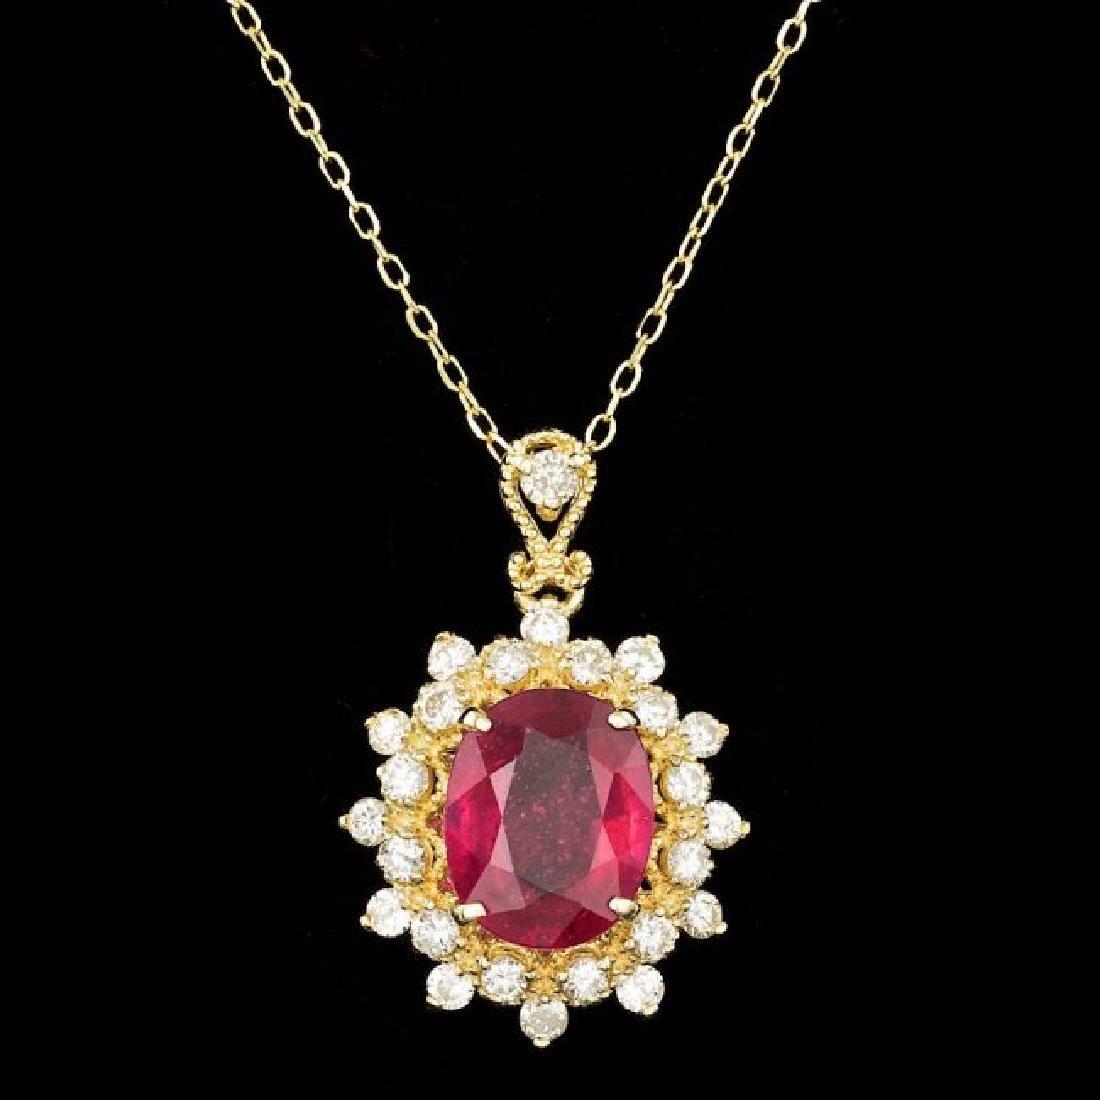 14k Gold 3.00ct Ruby 0.70ct Diamond Pendant